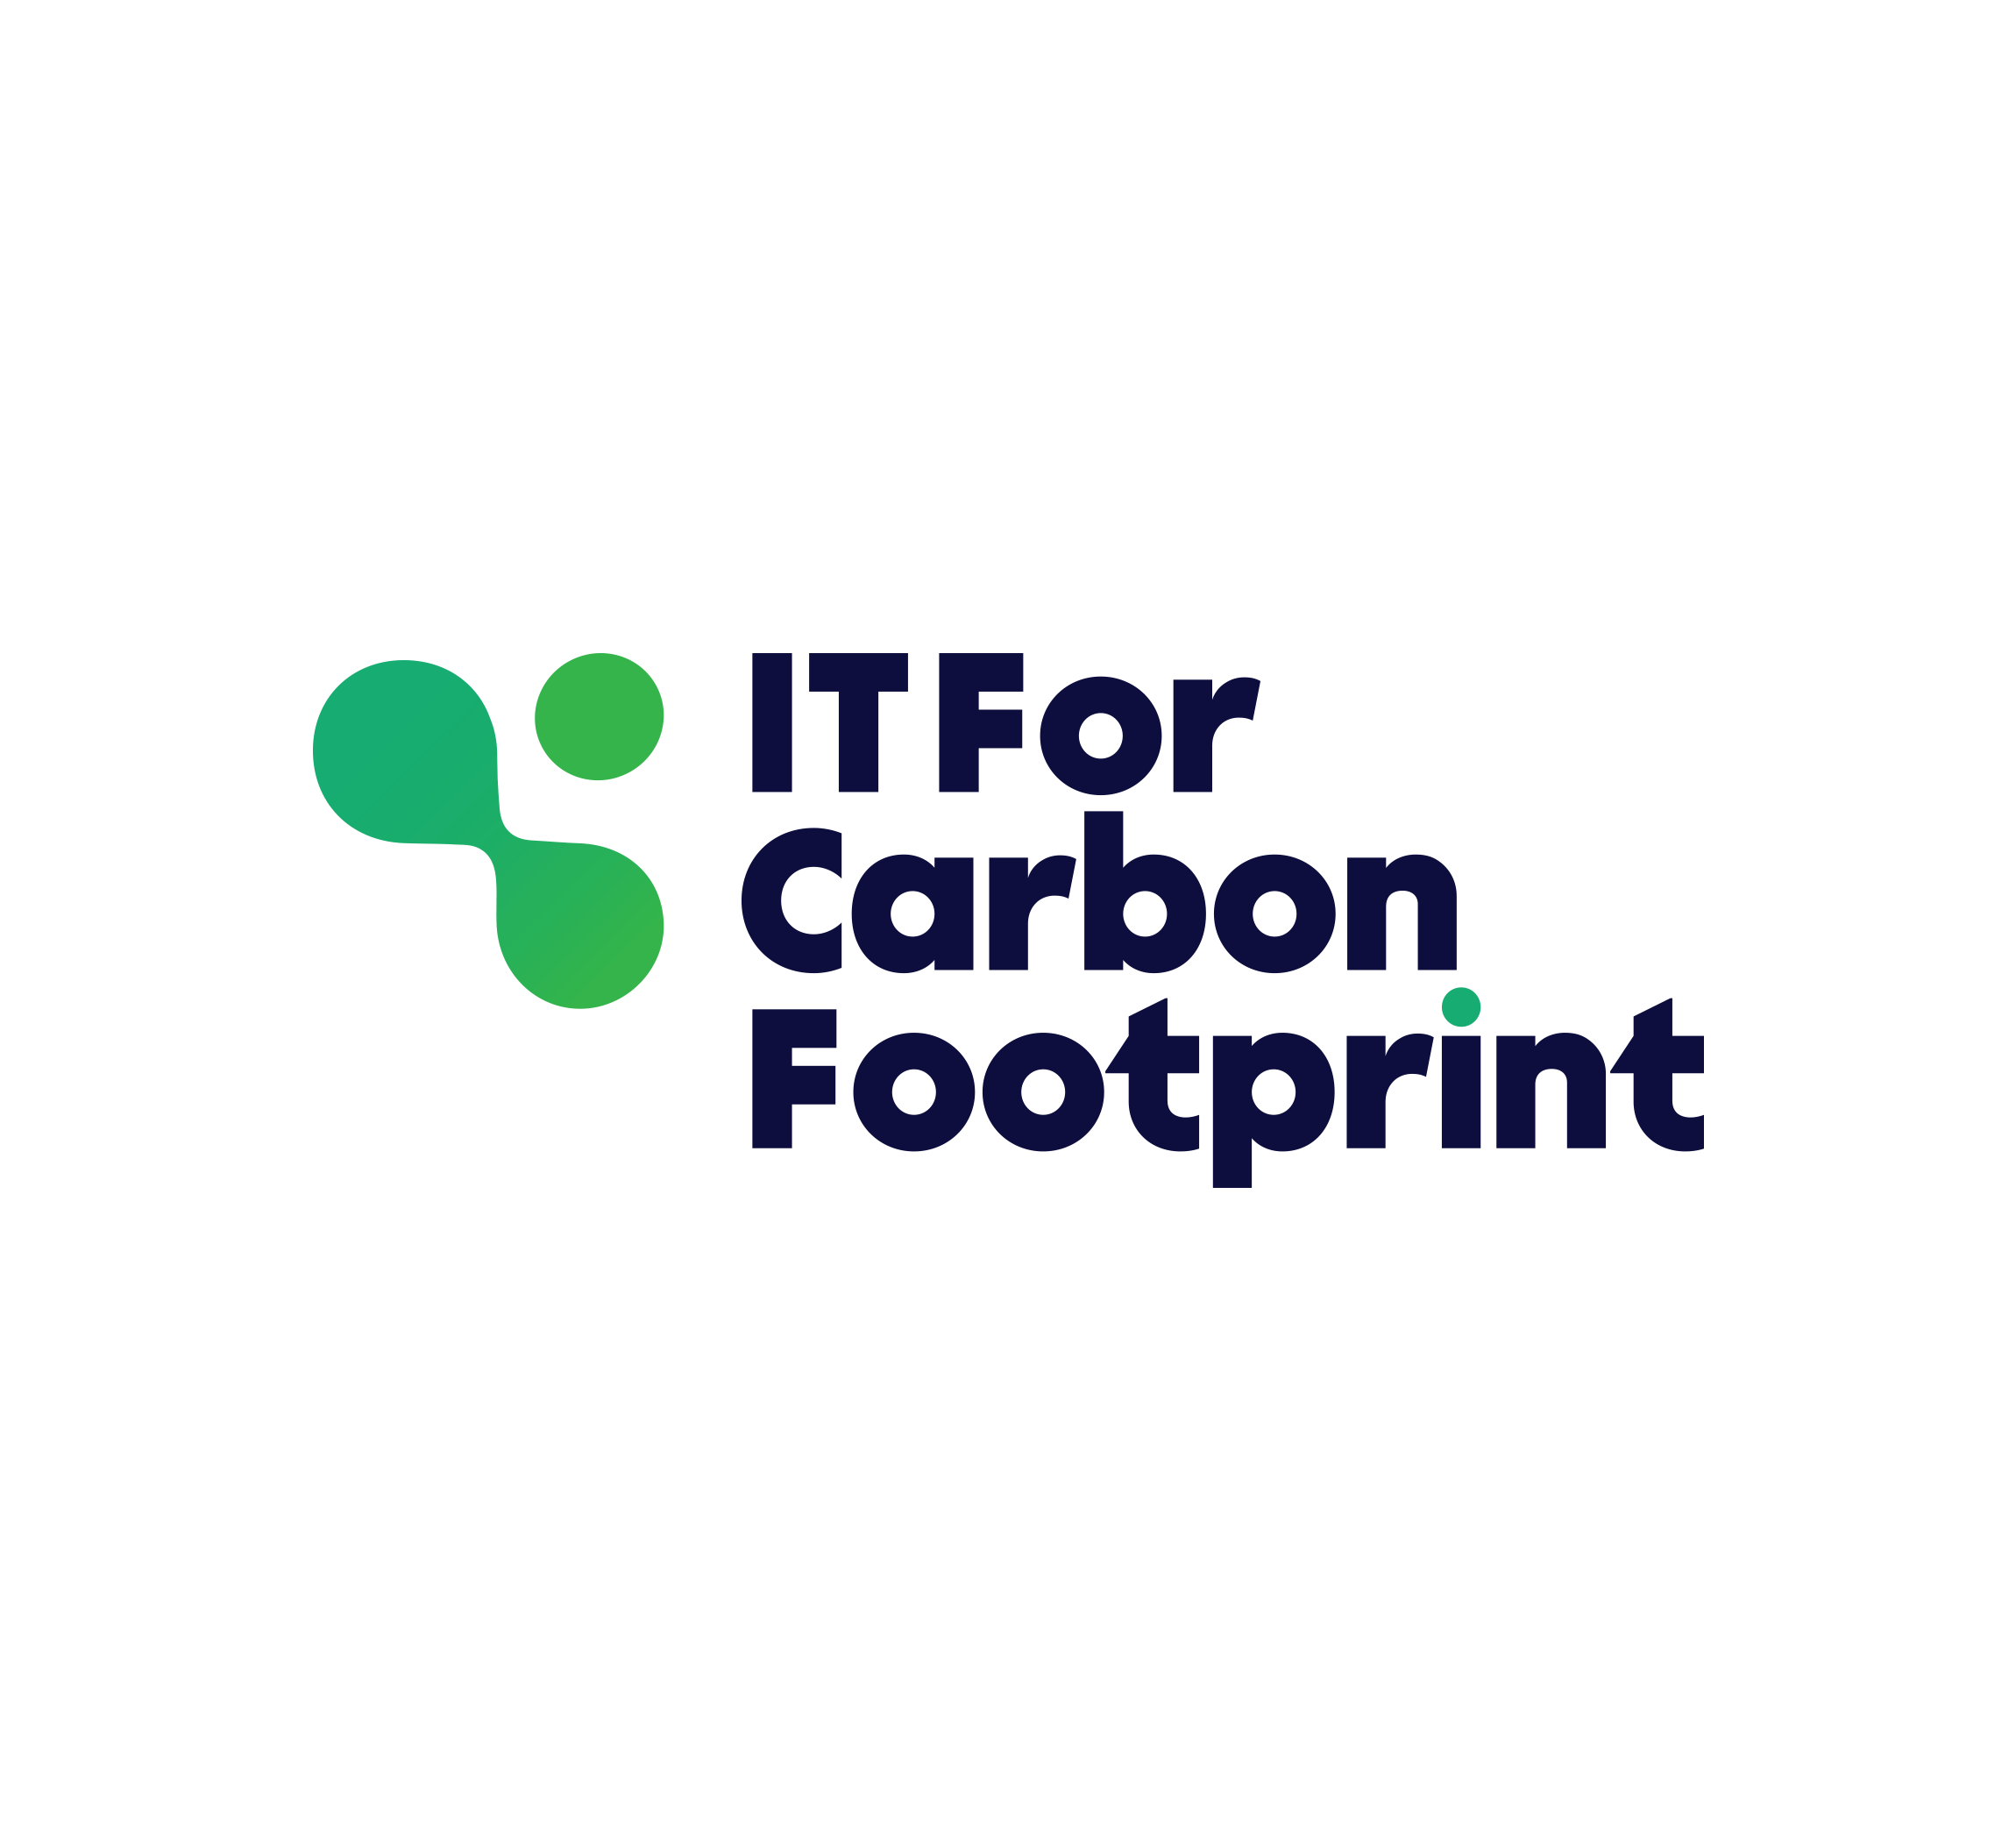 IT For Carbon Footprint — logo, key visual